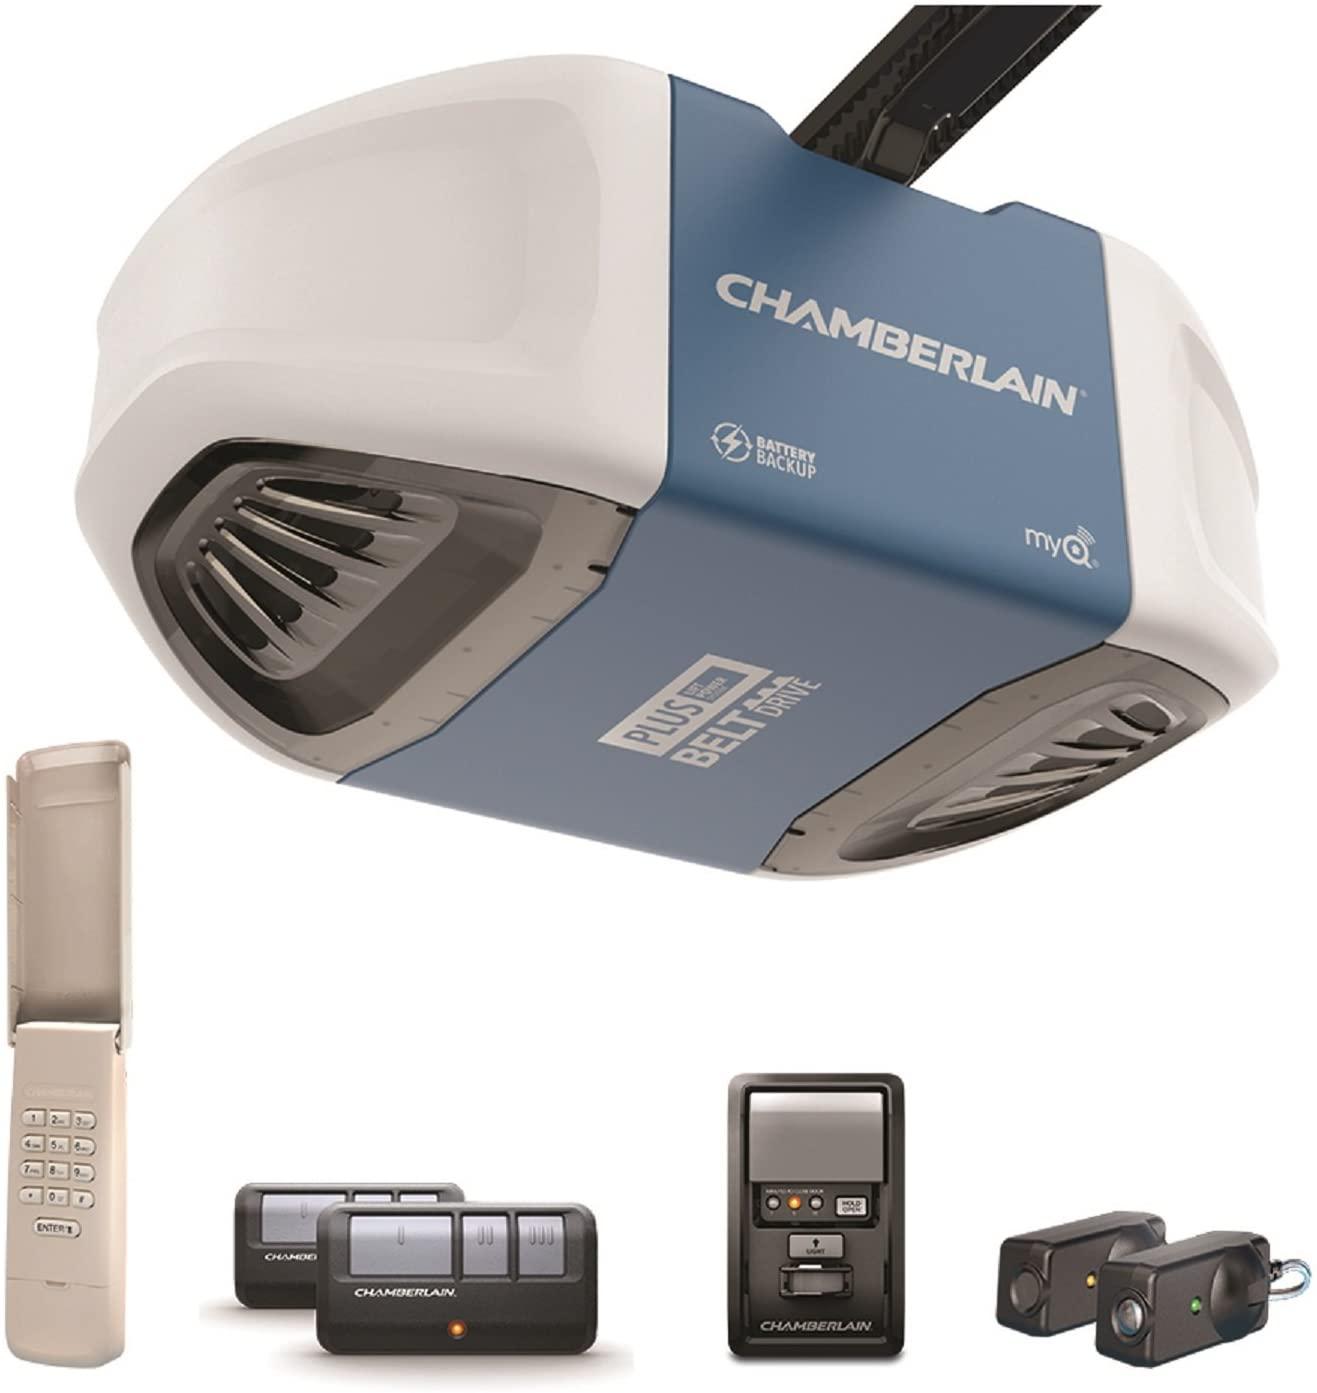 Chamberlain Group B730 Ultra-Quiet and Strong Belt Drive Garage Door Opener